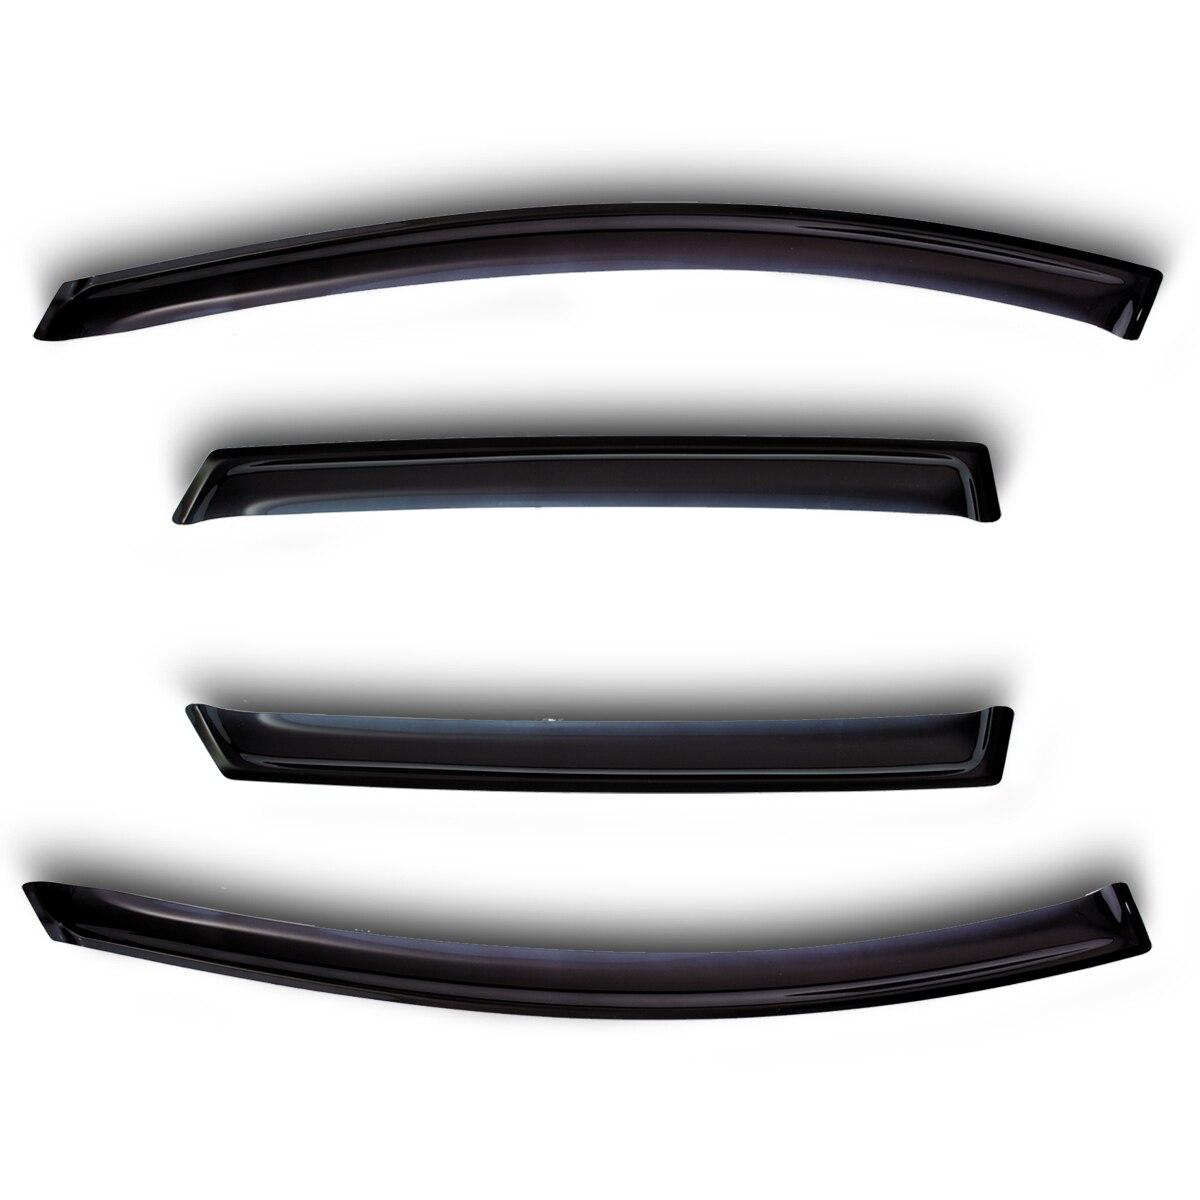 Window deflectors 4 door Chevrolet Aveo  2012 2014  NLD. schaves1232 (Chevrolet Aveo) Awnings & Shelters     - title=